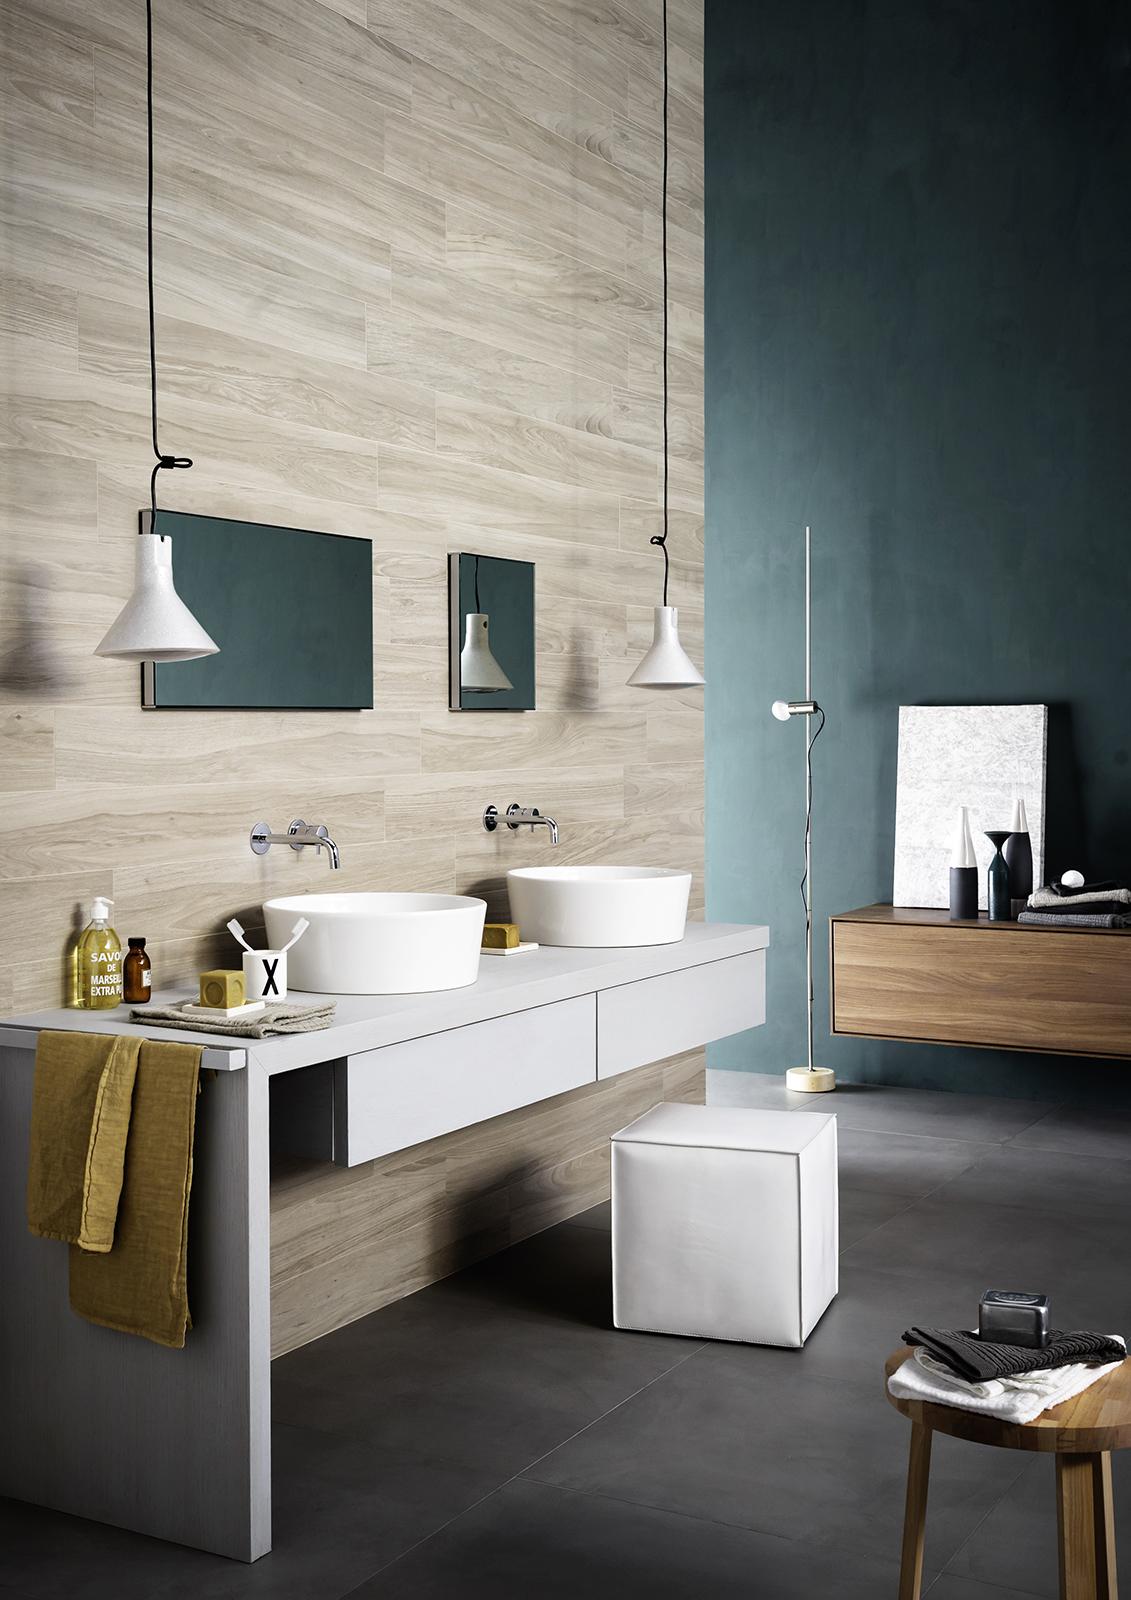 Treverkchic wood effect porcelain stoneware marazzi - Salle de bain parquet bois ...